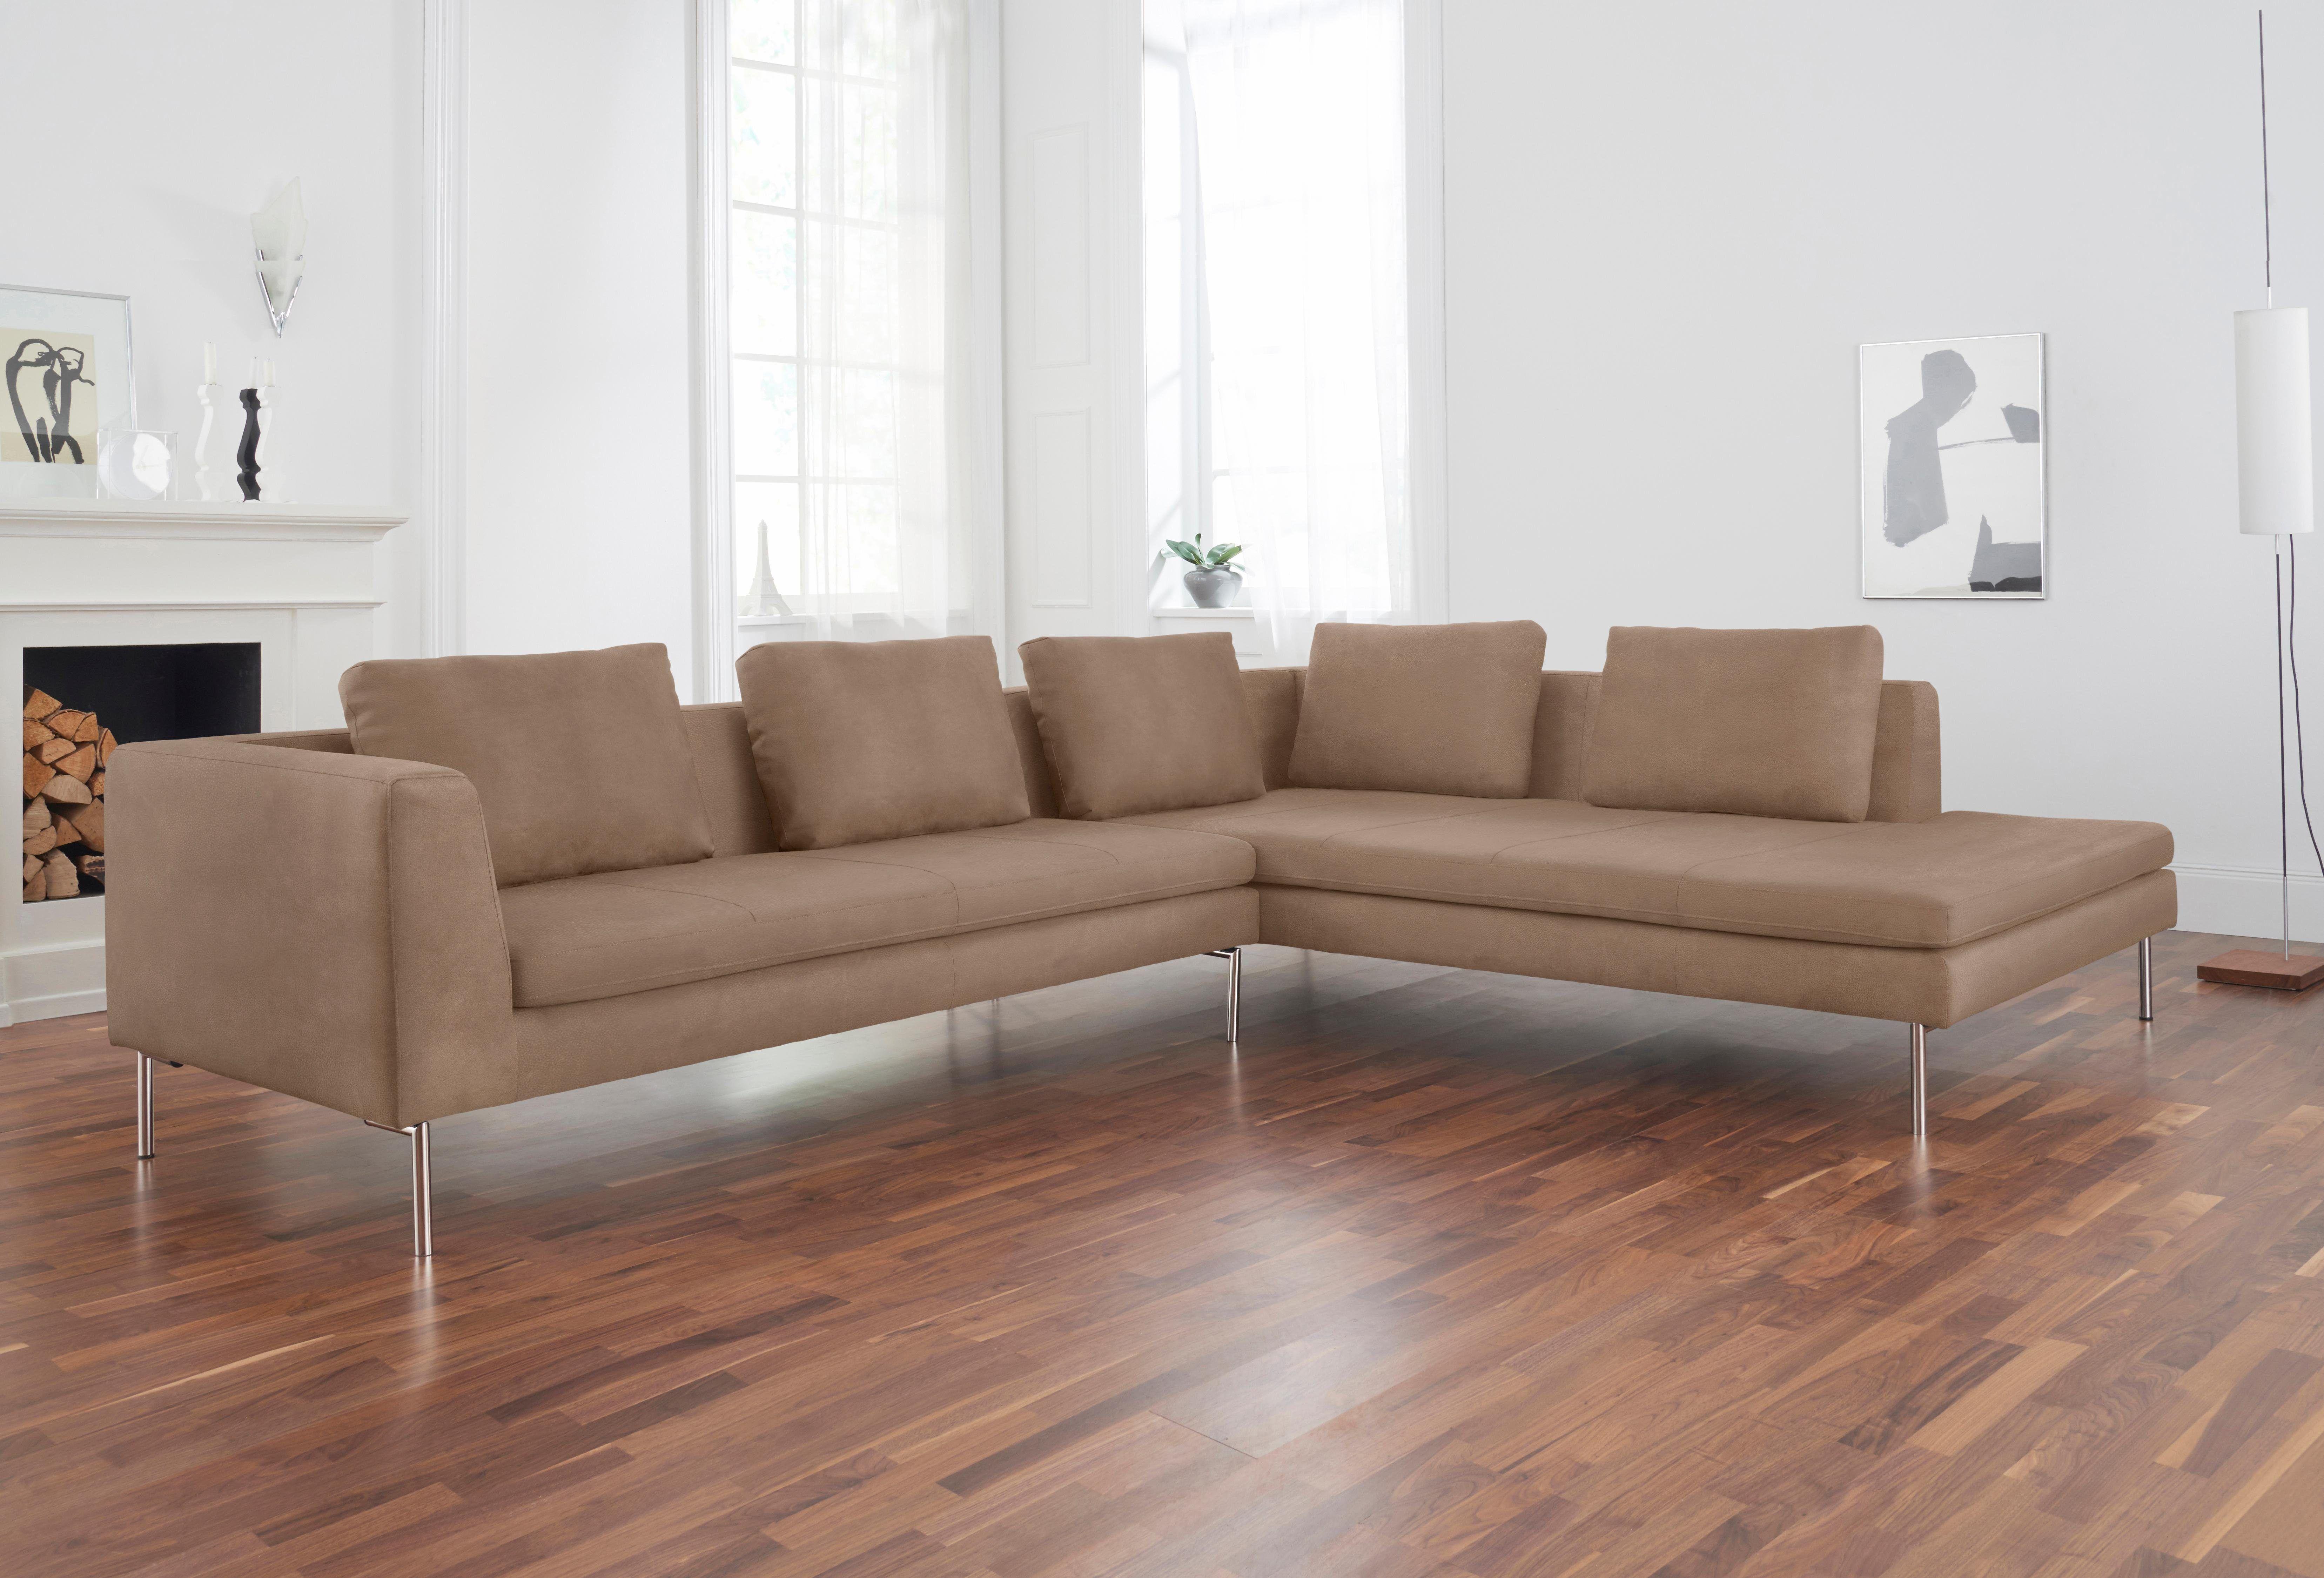 Wohnzimmer sofas ecksofa grau sitzecke silber diapers silver